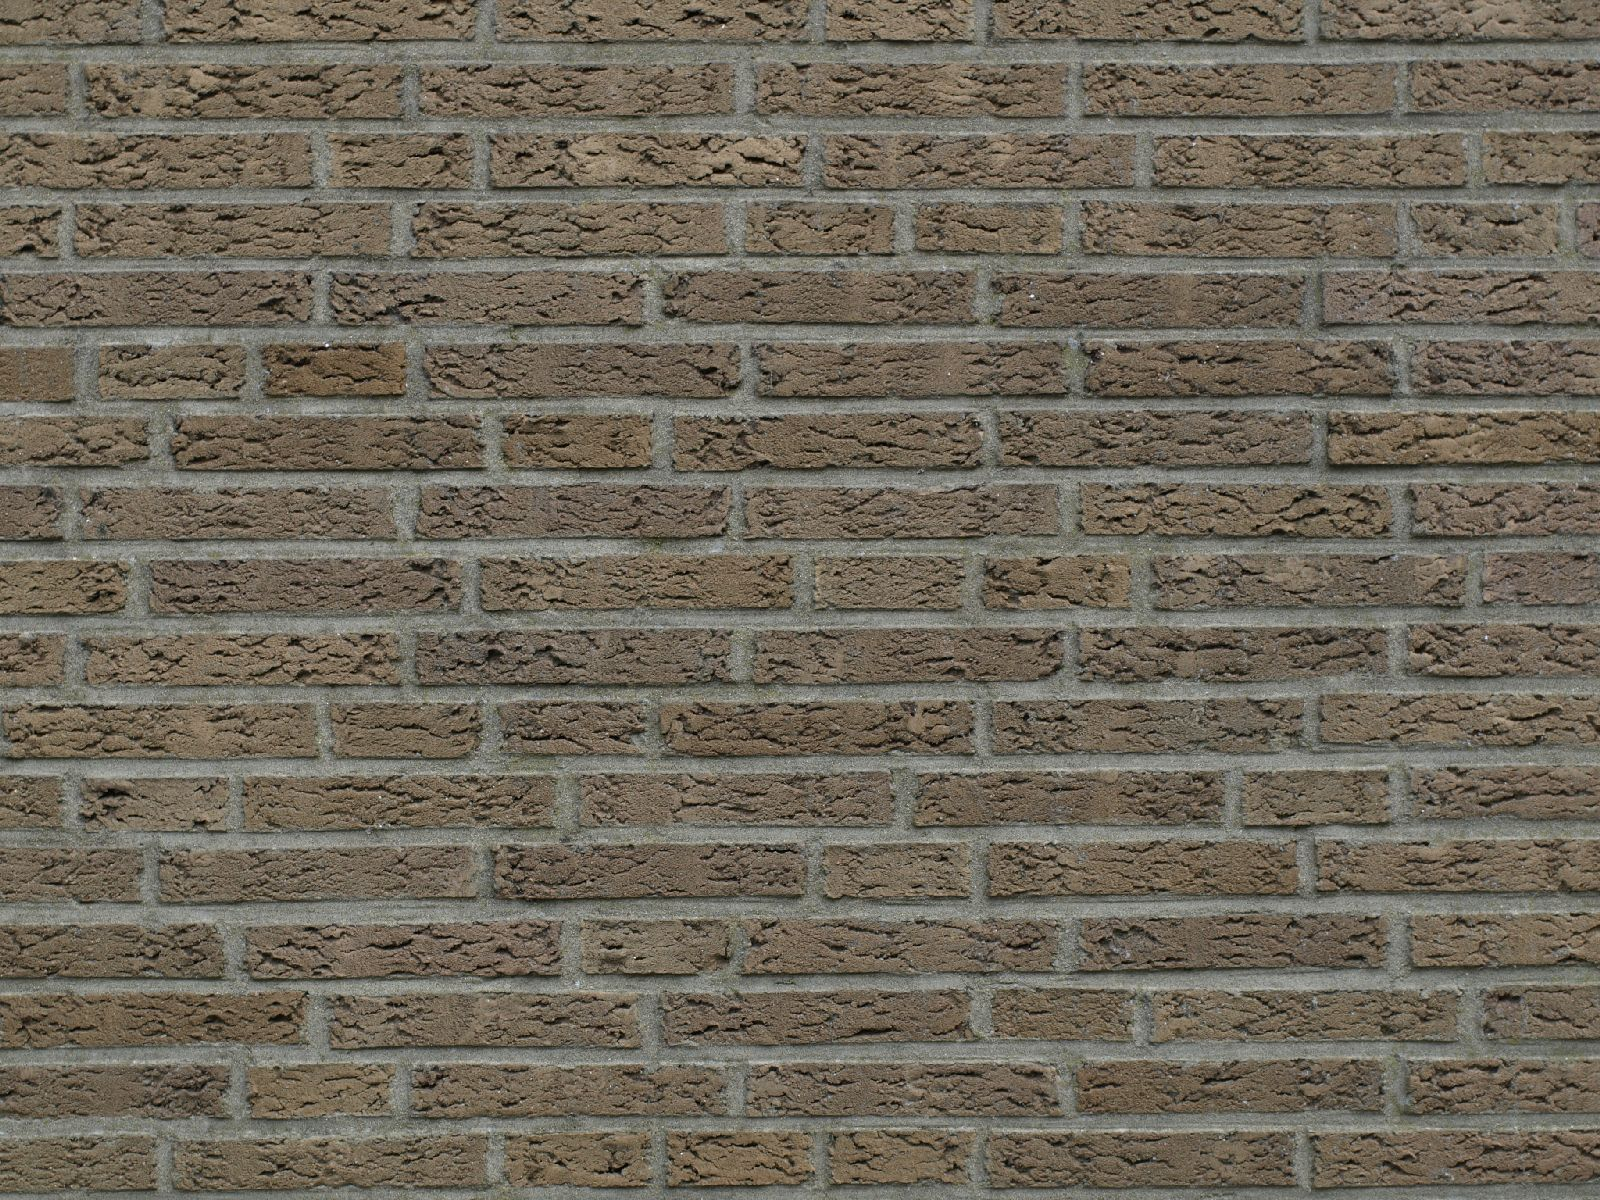 Wand-Mauerwerk-Backstein_Textur_A_P5232914